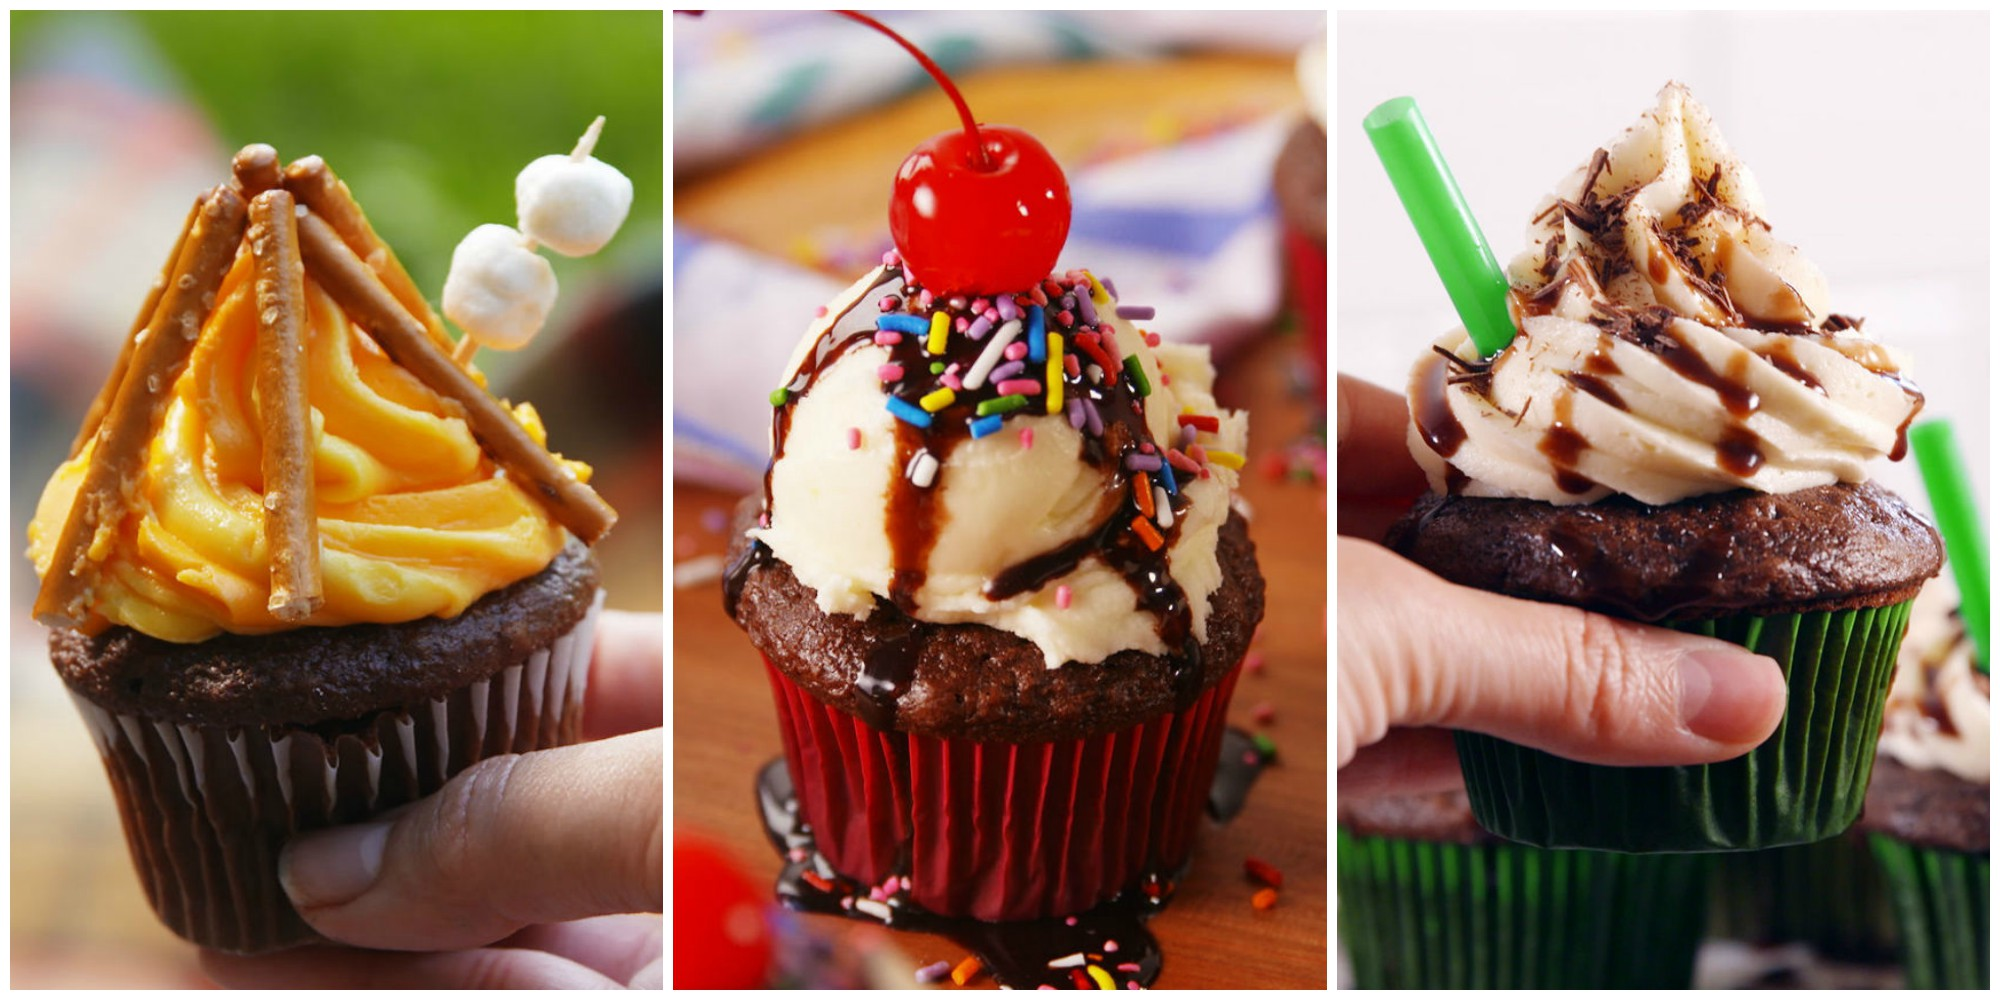 Easy Bunny Cupcakes - Hoosier Homemade |Cute Easy Cupcake Decorating Ideas